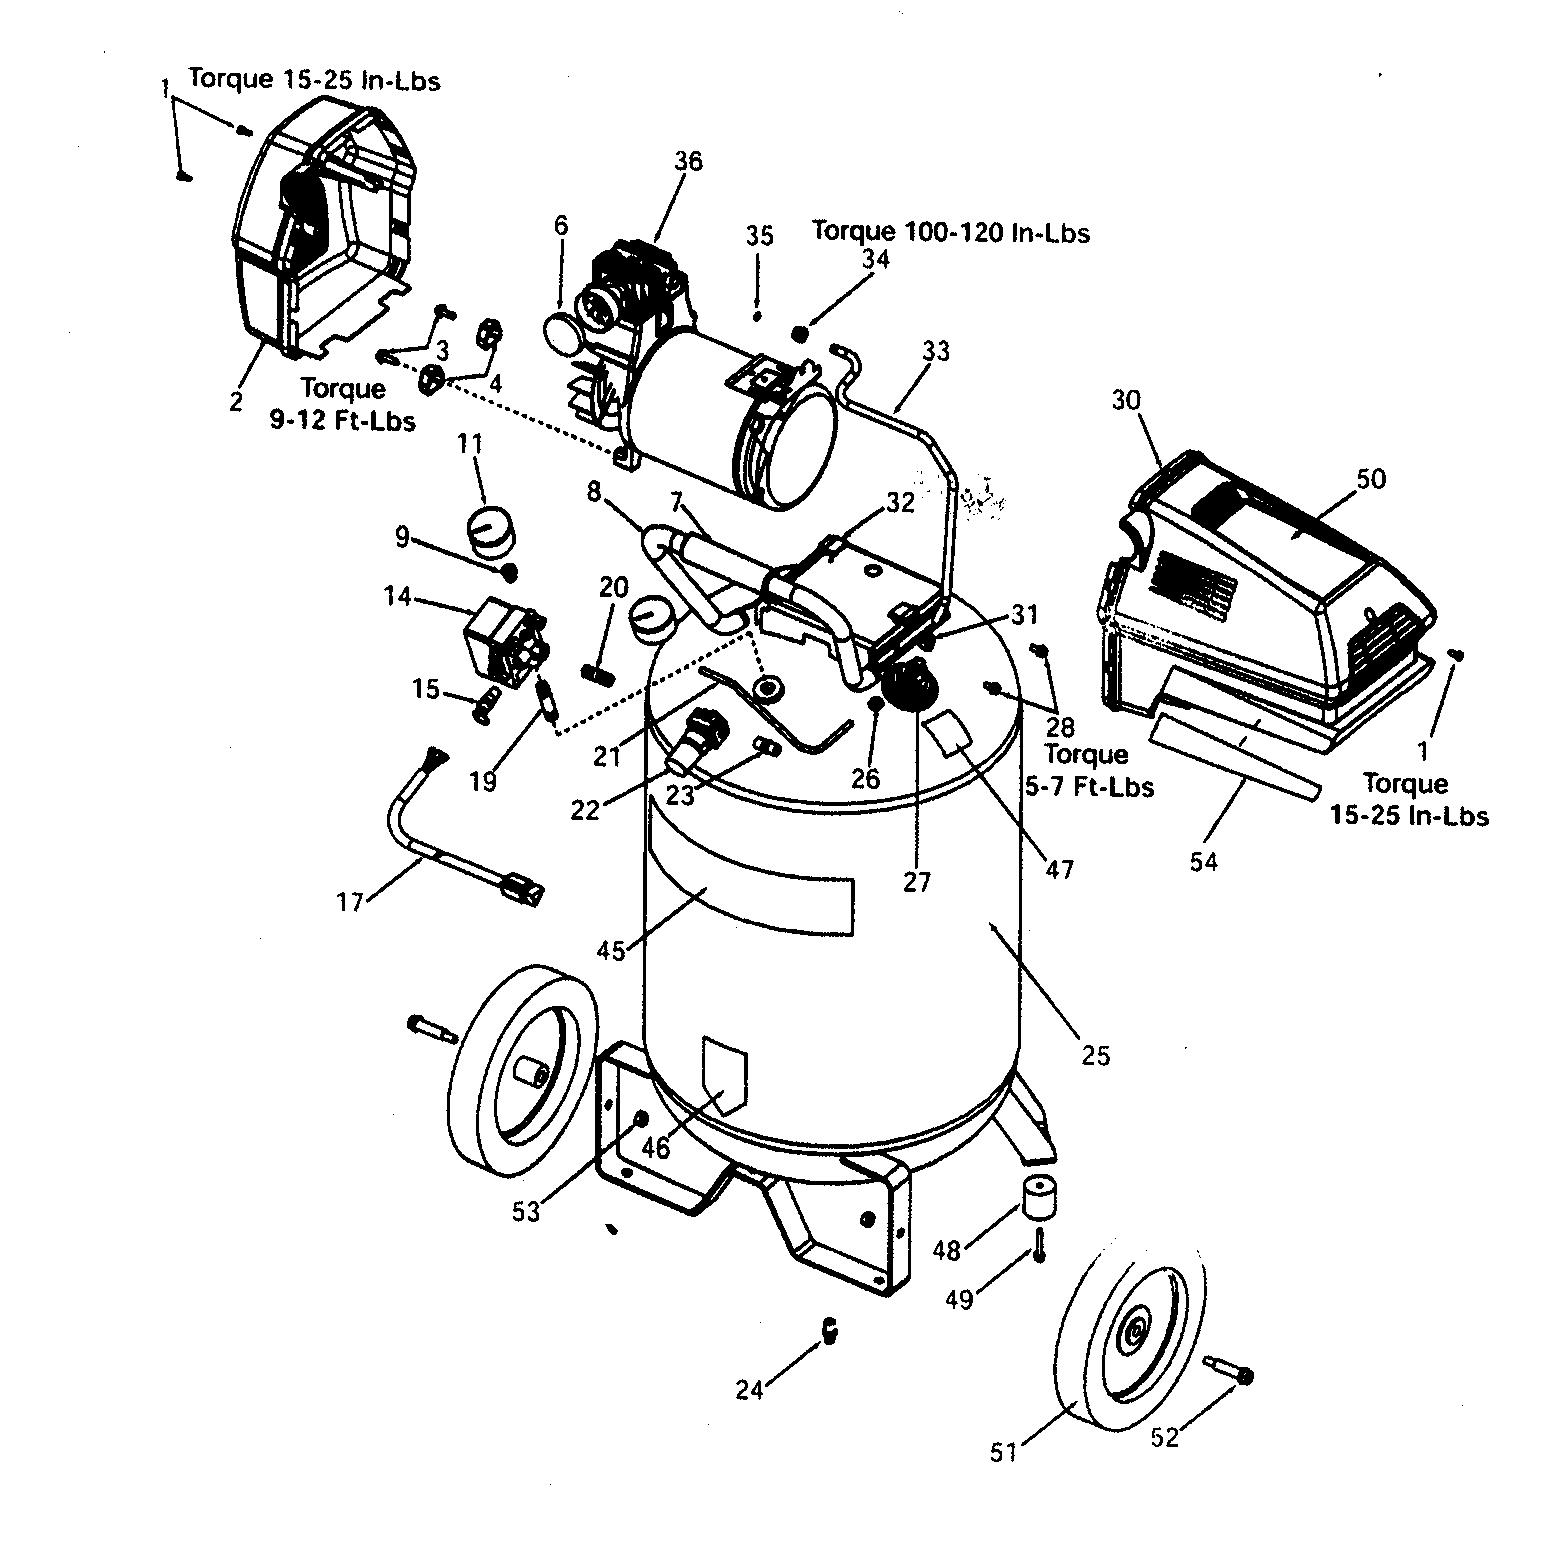 hight resolution of craftsman compressor wiring diagram wiring diagram sort wiring diagram for craftsman air compressor